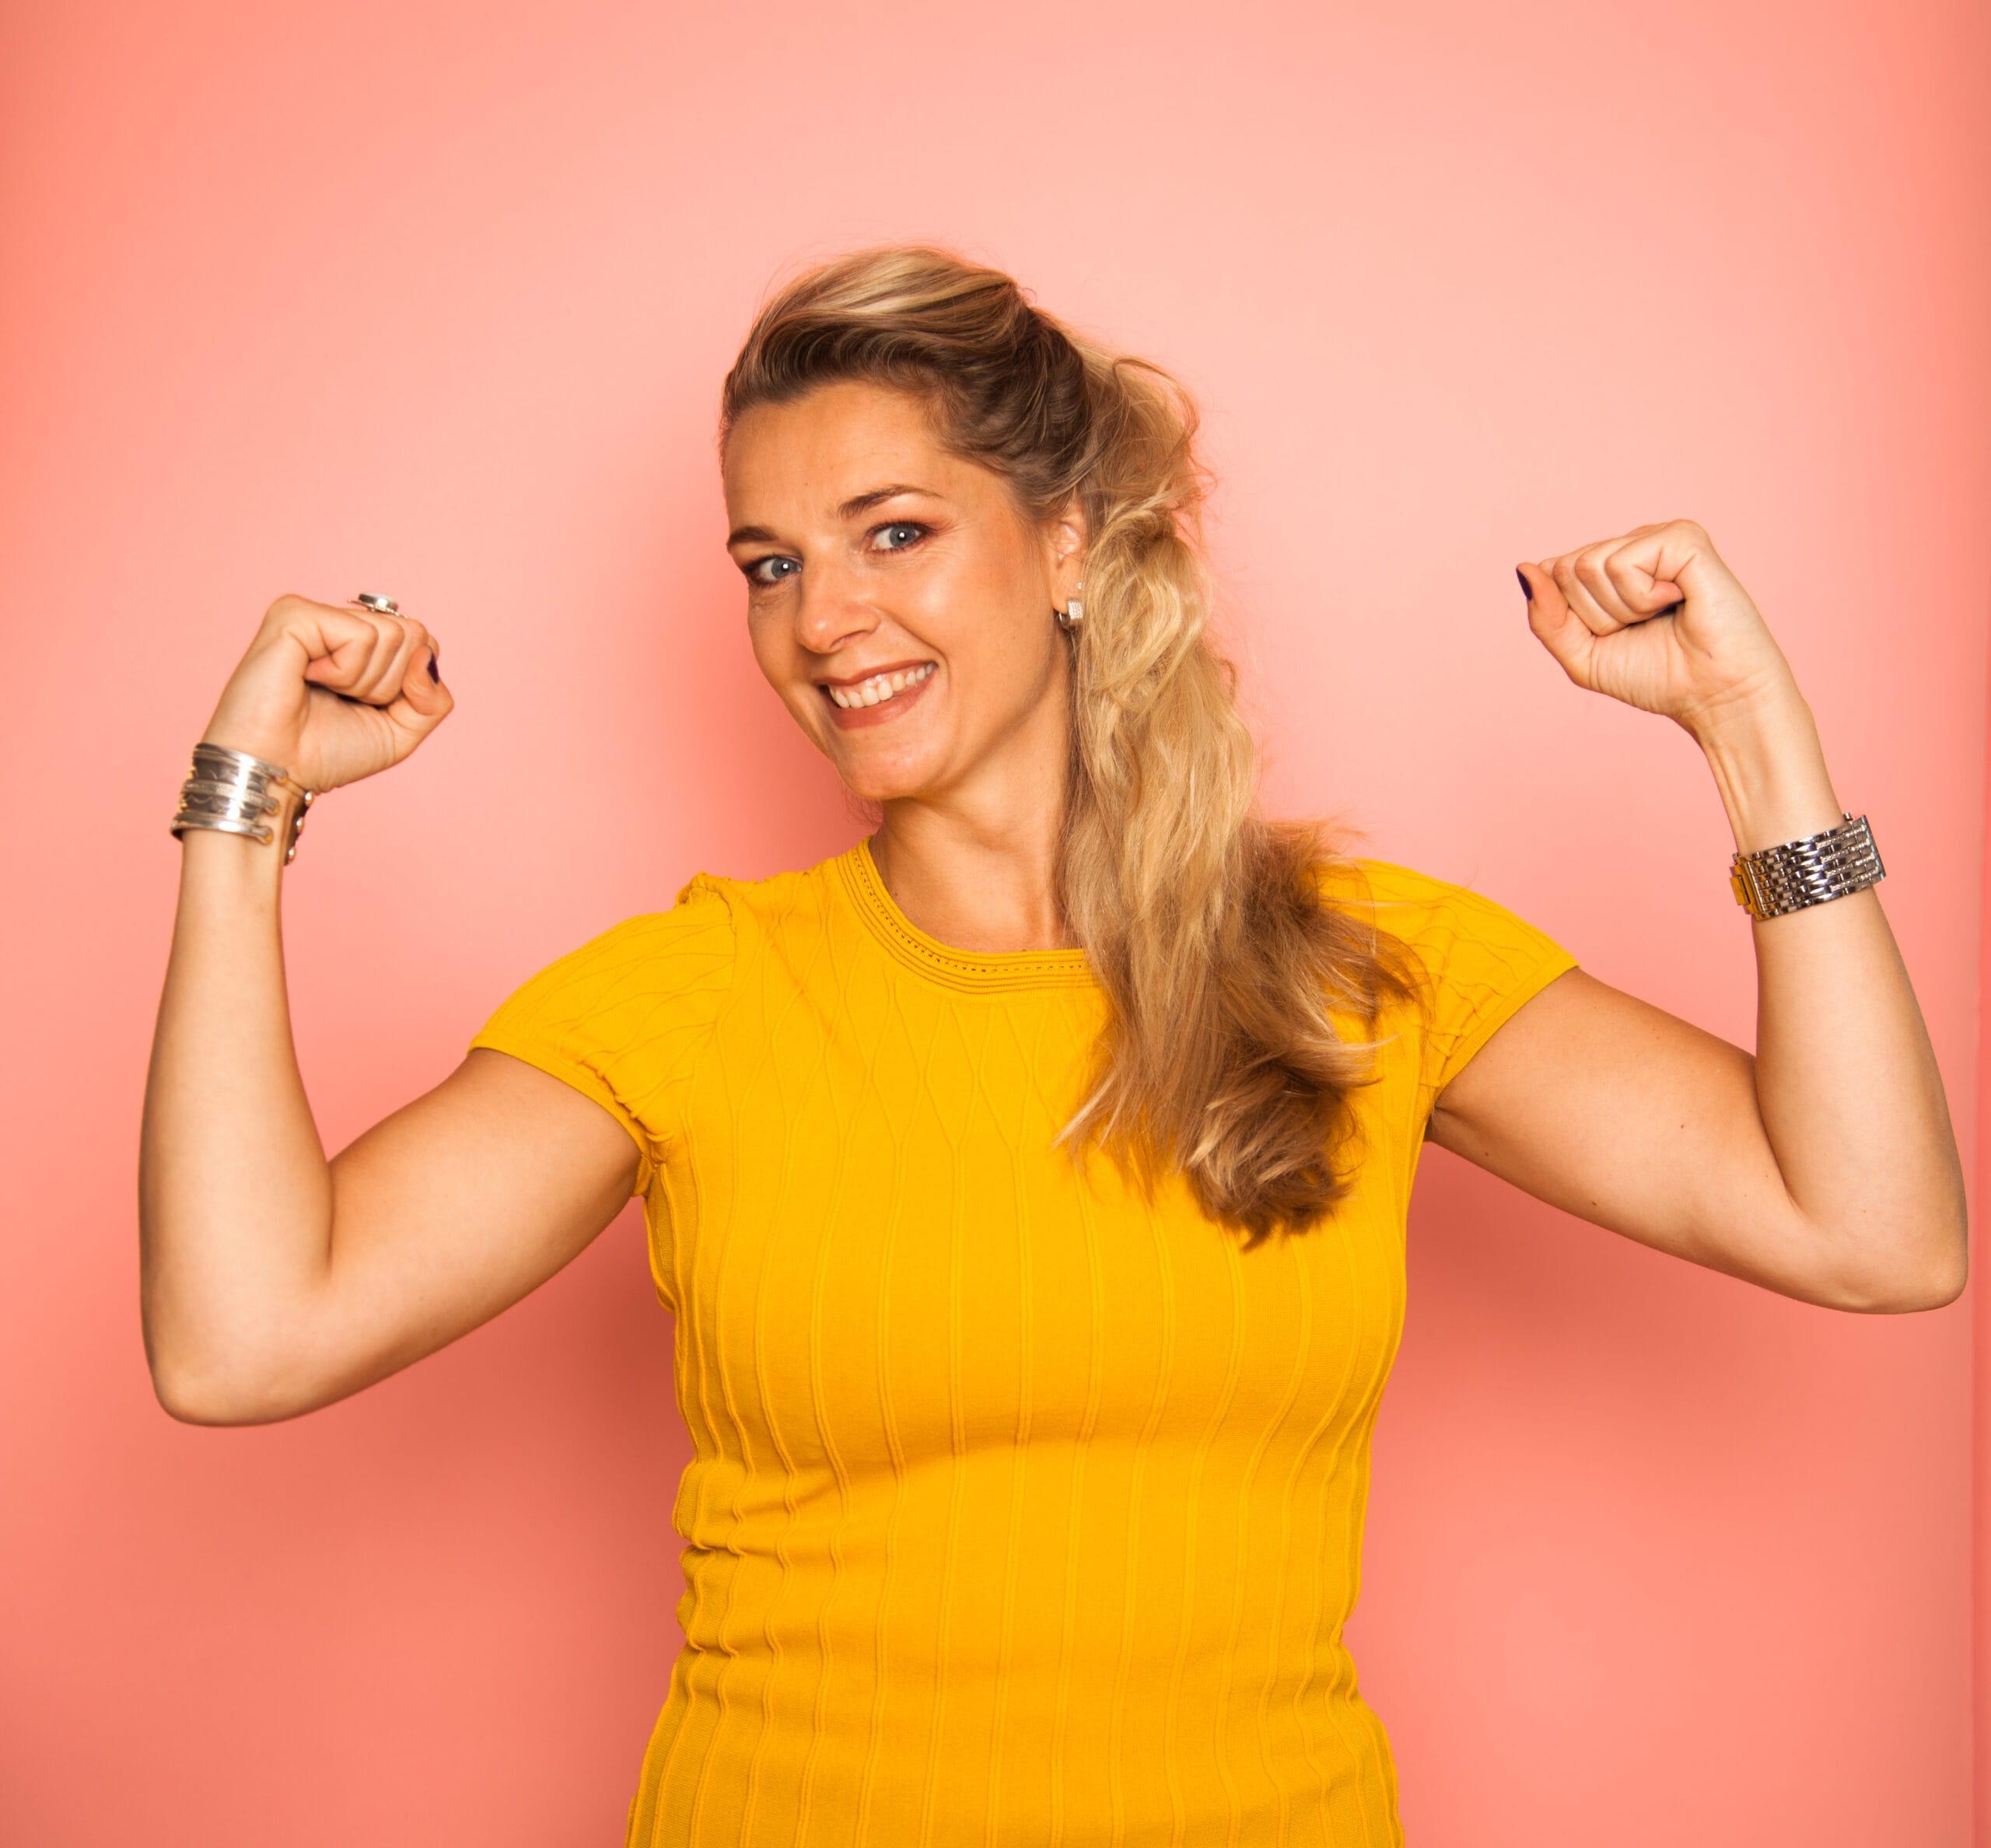 MunayQi KrijgerGodin Jacqueline Brandes Stress Transformatie Therapeut